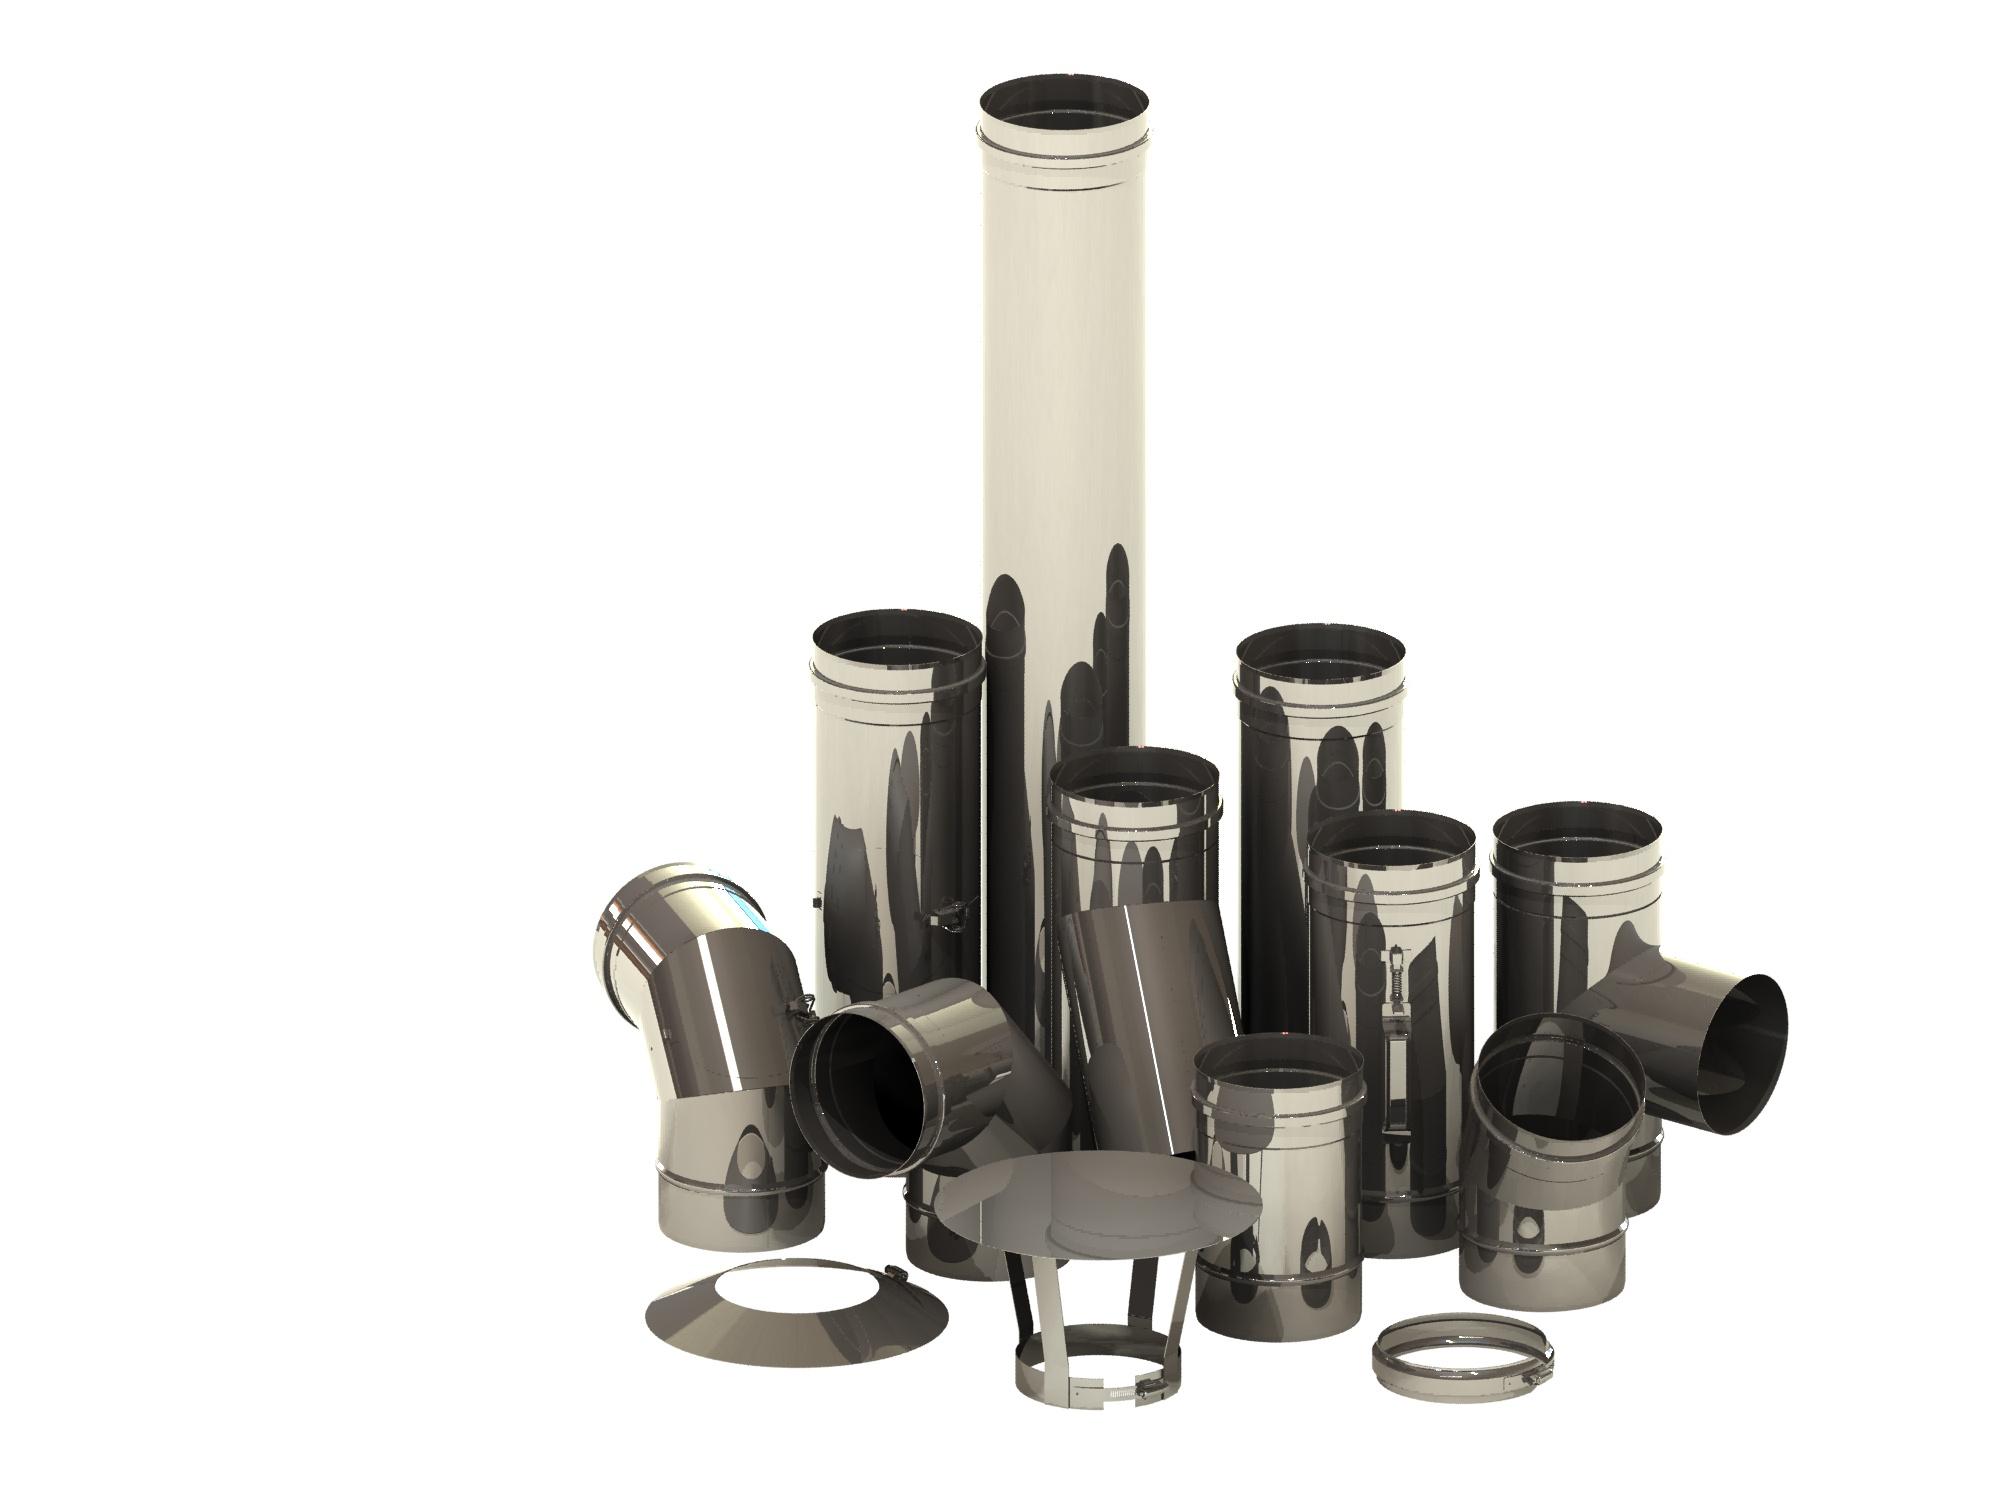 Schornsteinsanierung einwandig Ø 180 mm – Tecnovis TEC-EW-Classic